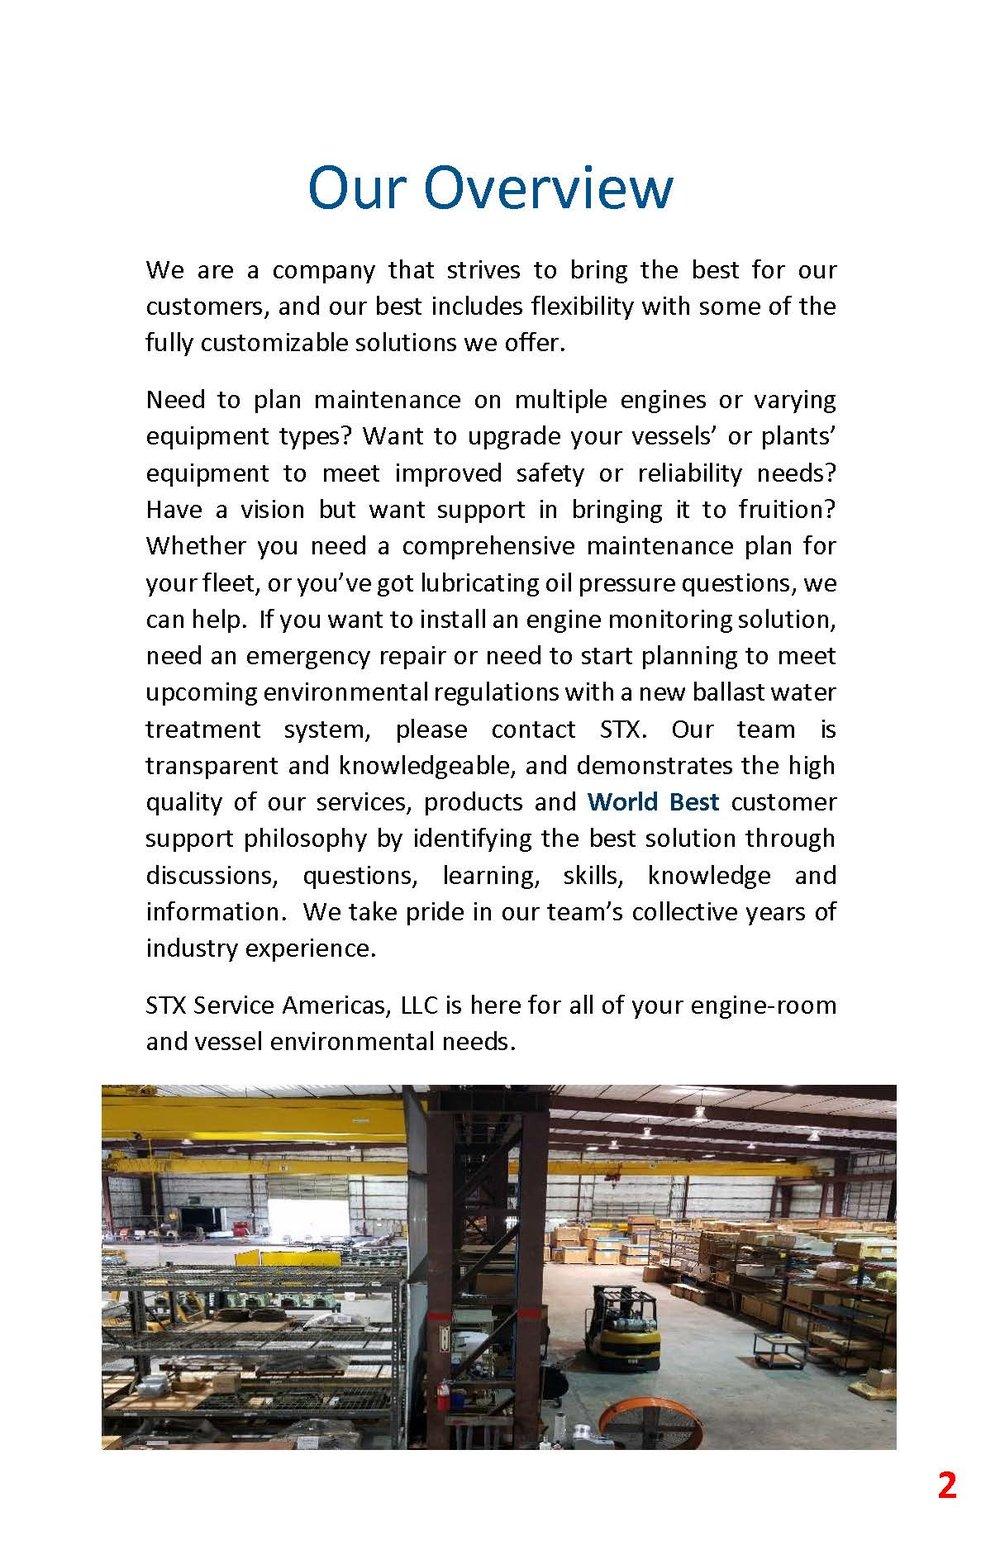 STXSA Brochure 2018_Page_04.jpg